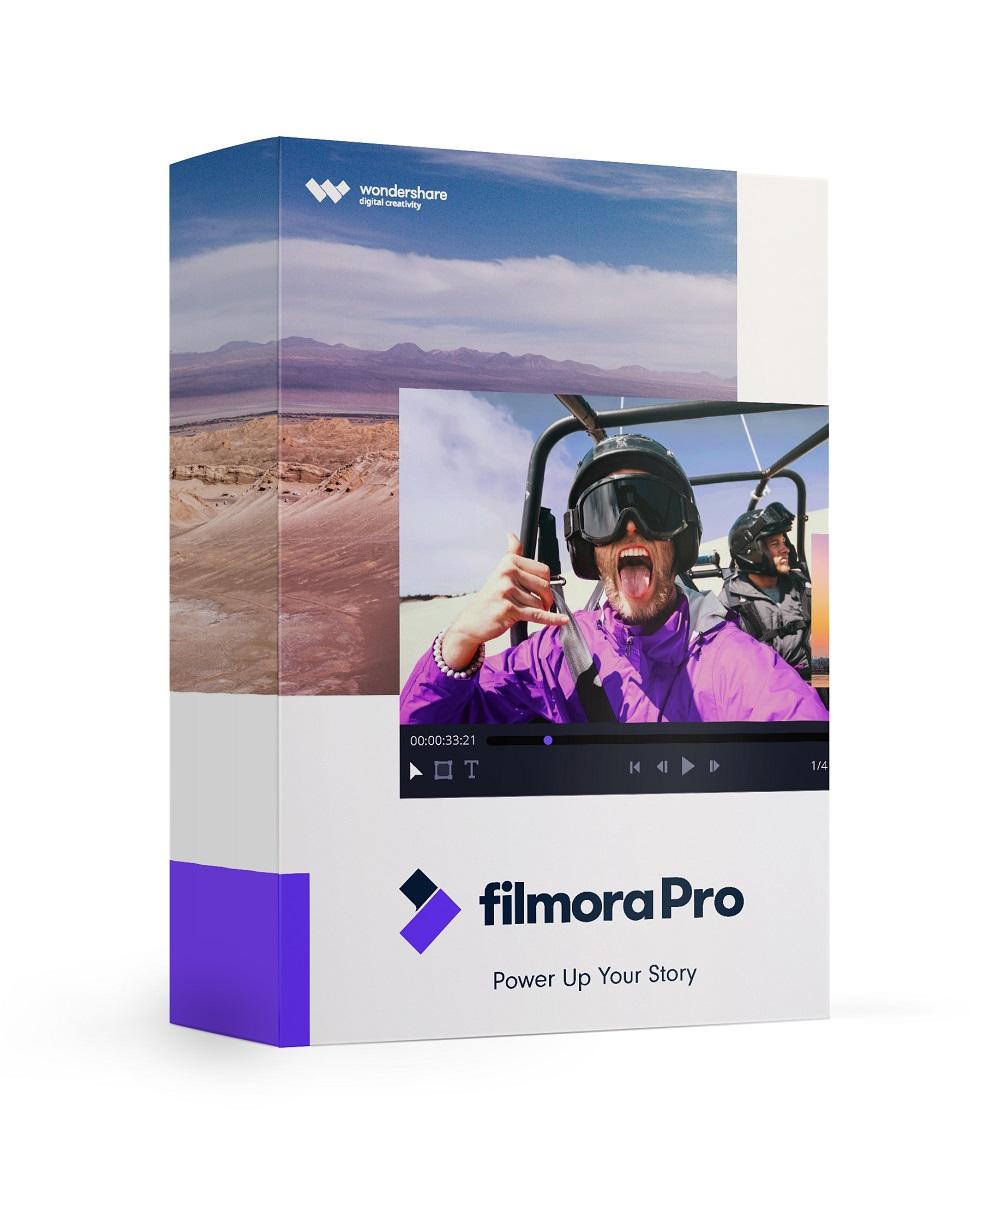 25% Off FilmoraPro Discount Code